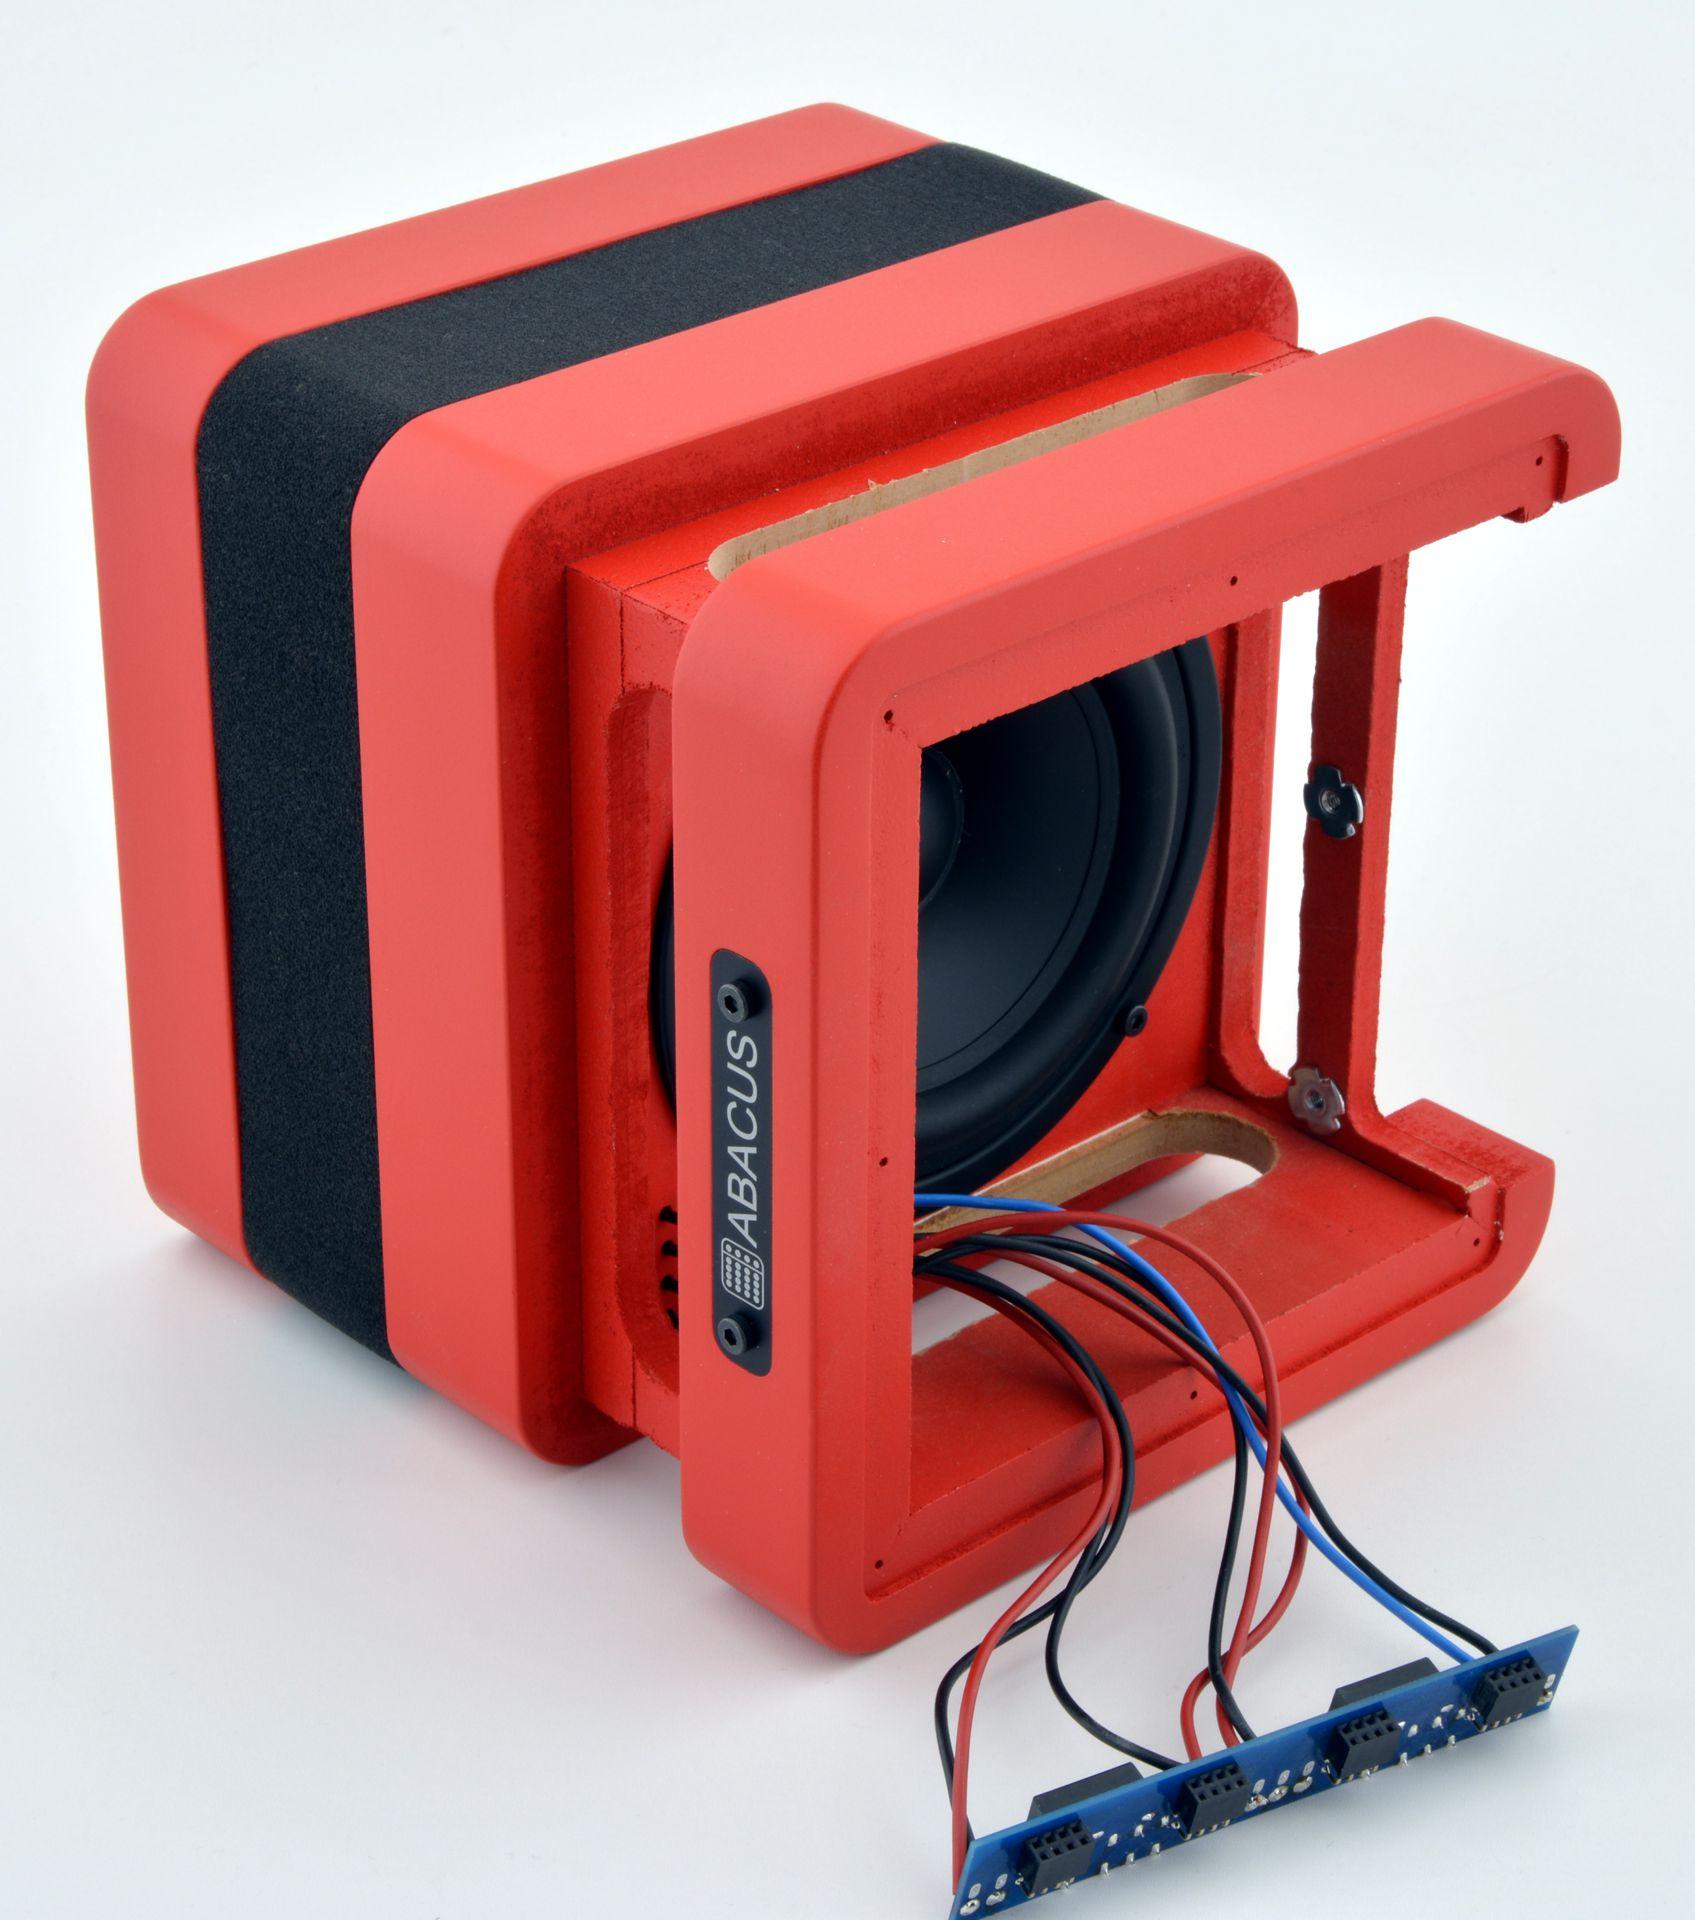 Anschlussboard und Elektronikschacht